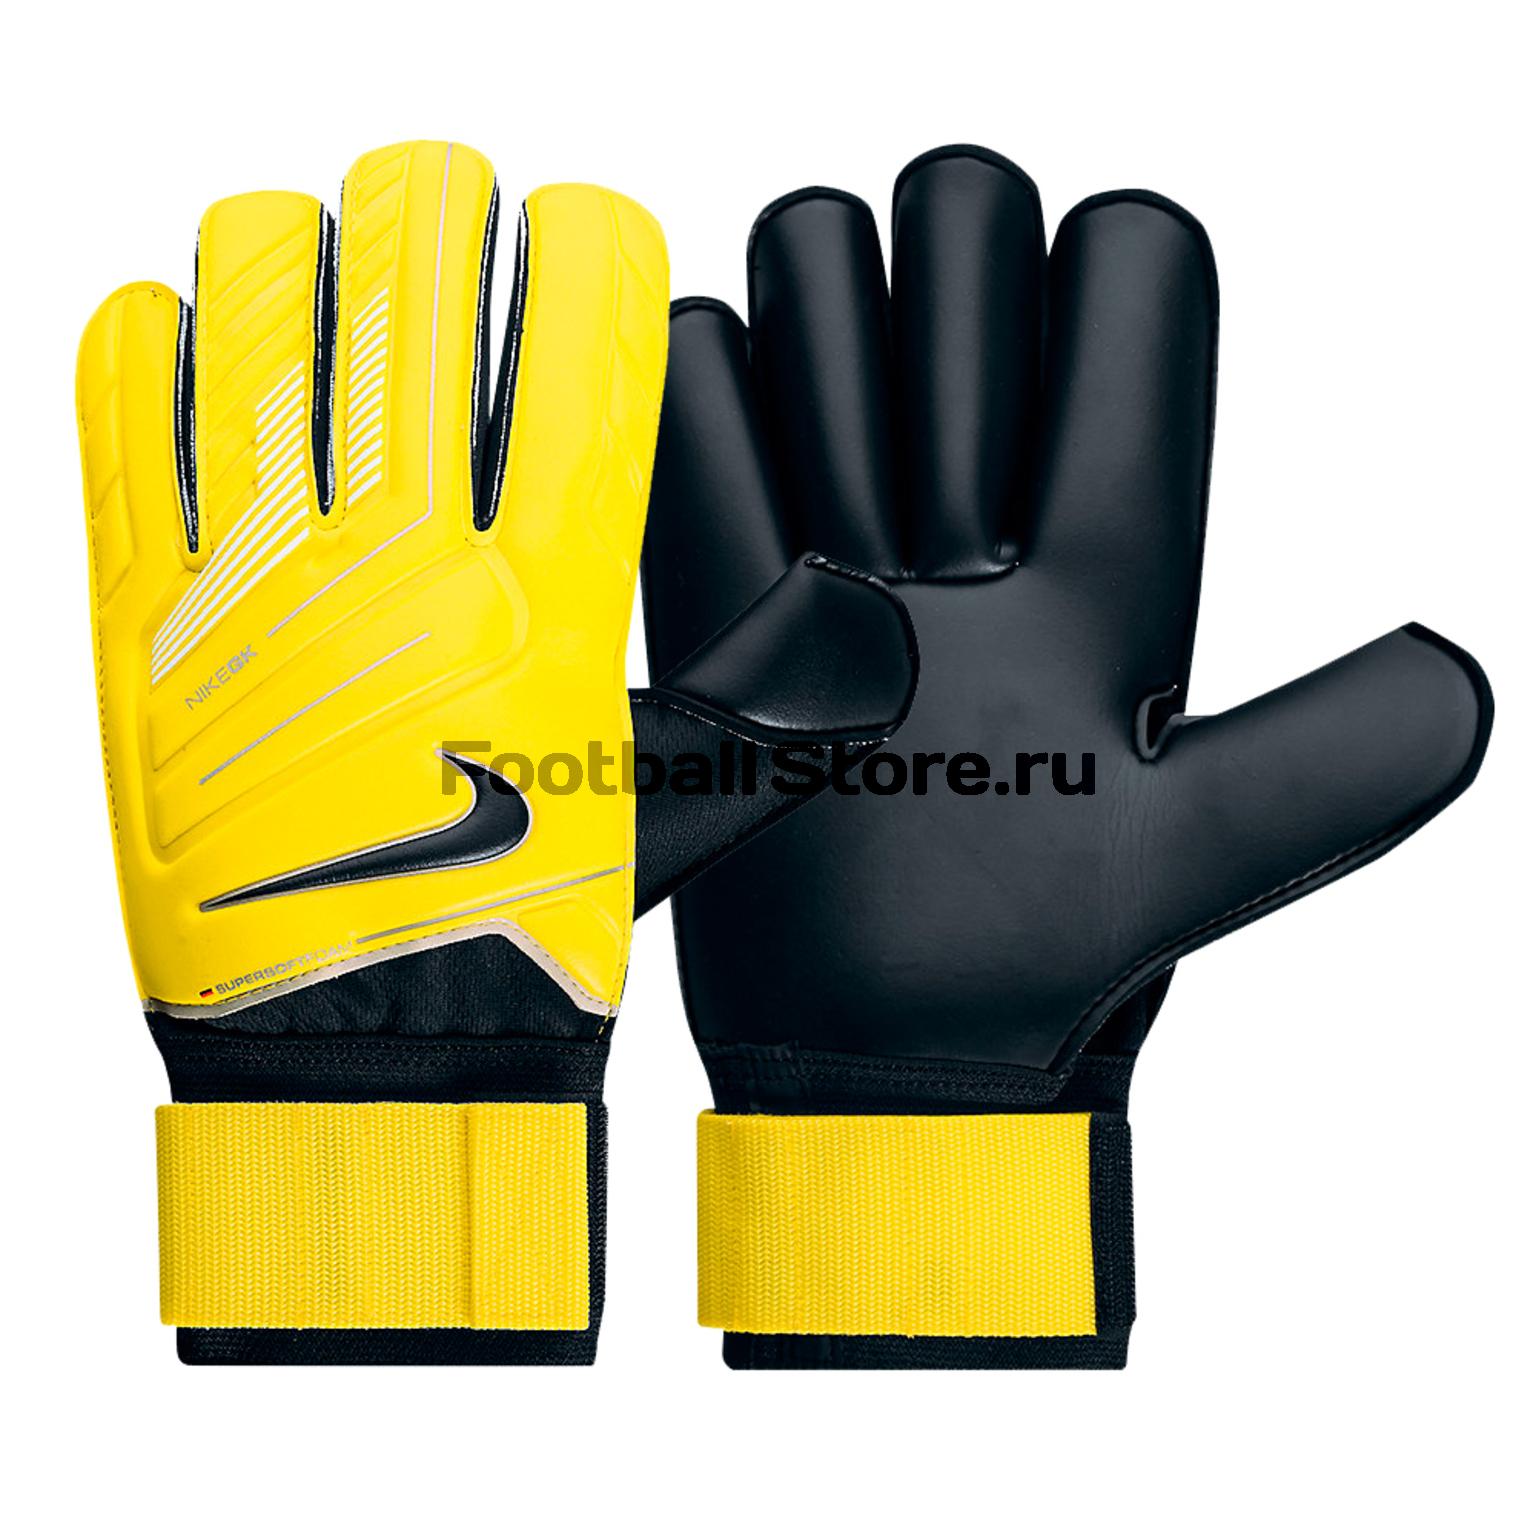 Перчатки Nike Перчатки вратарские Nike GK Gunn Cut PRO GS0255-700